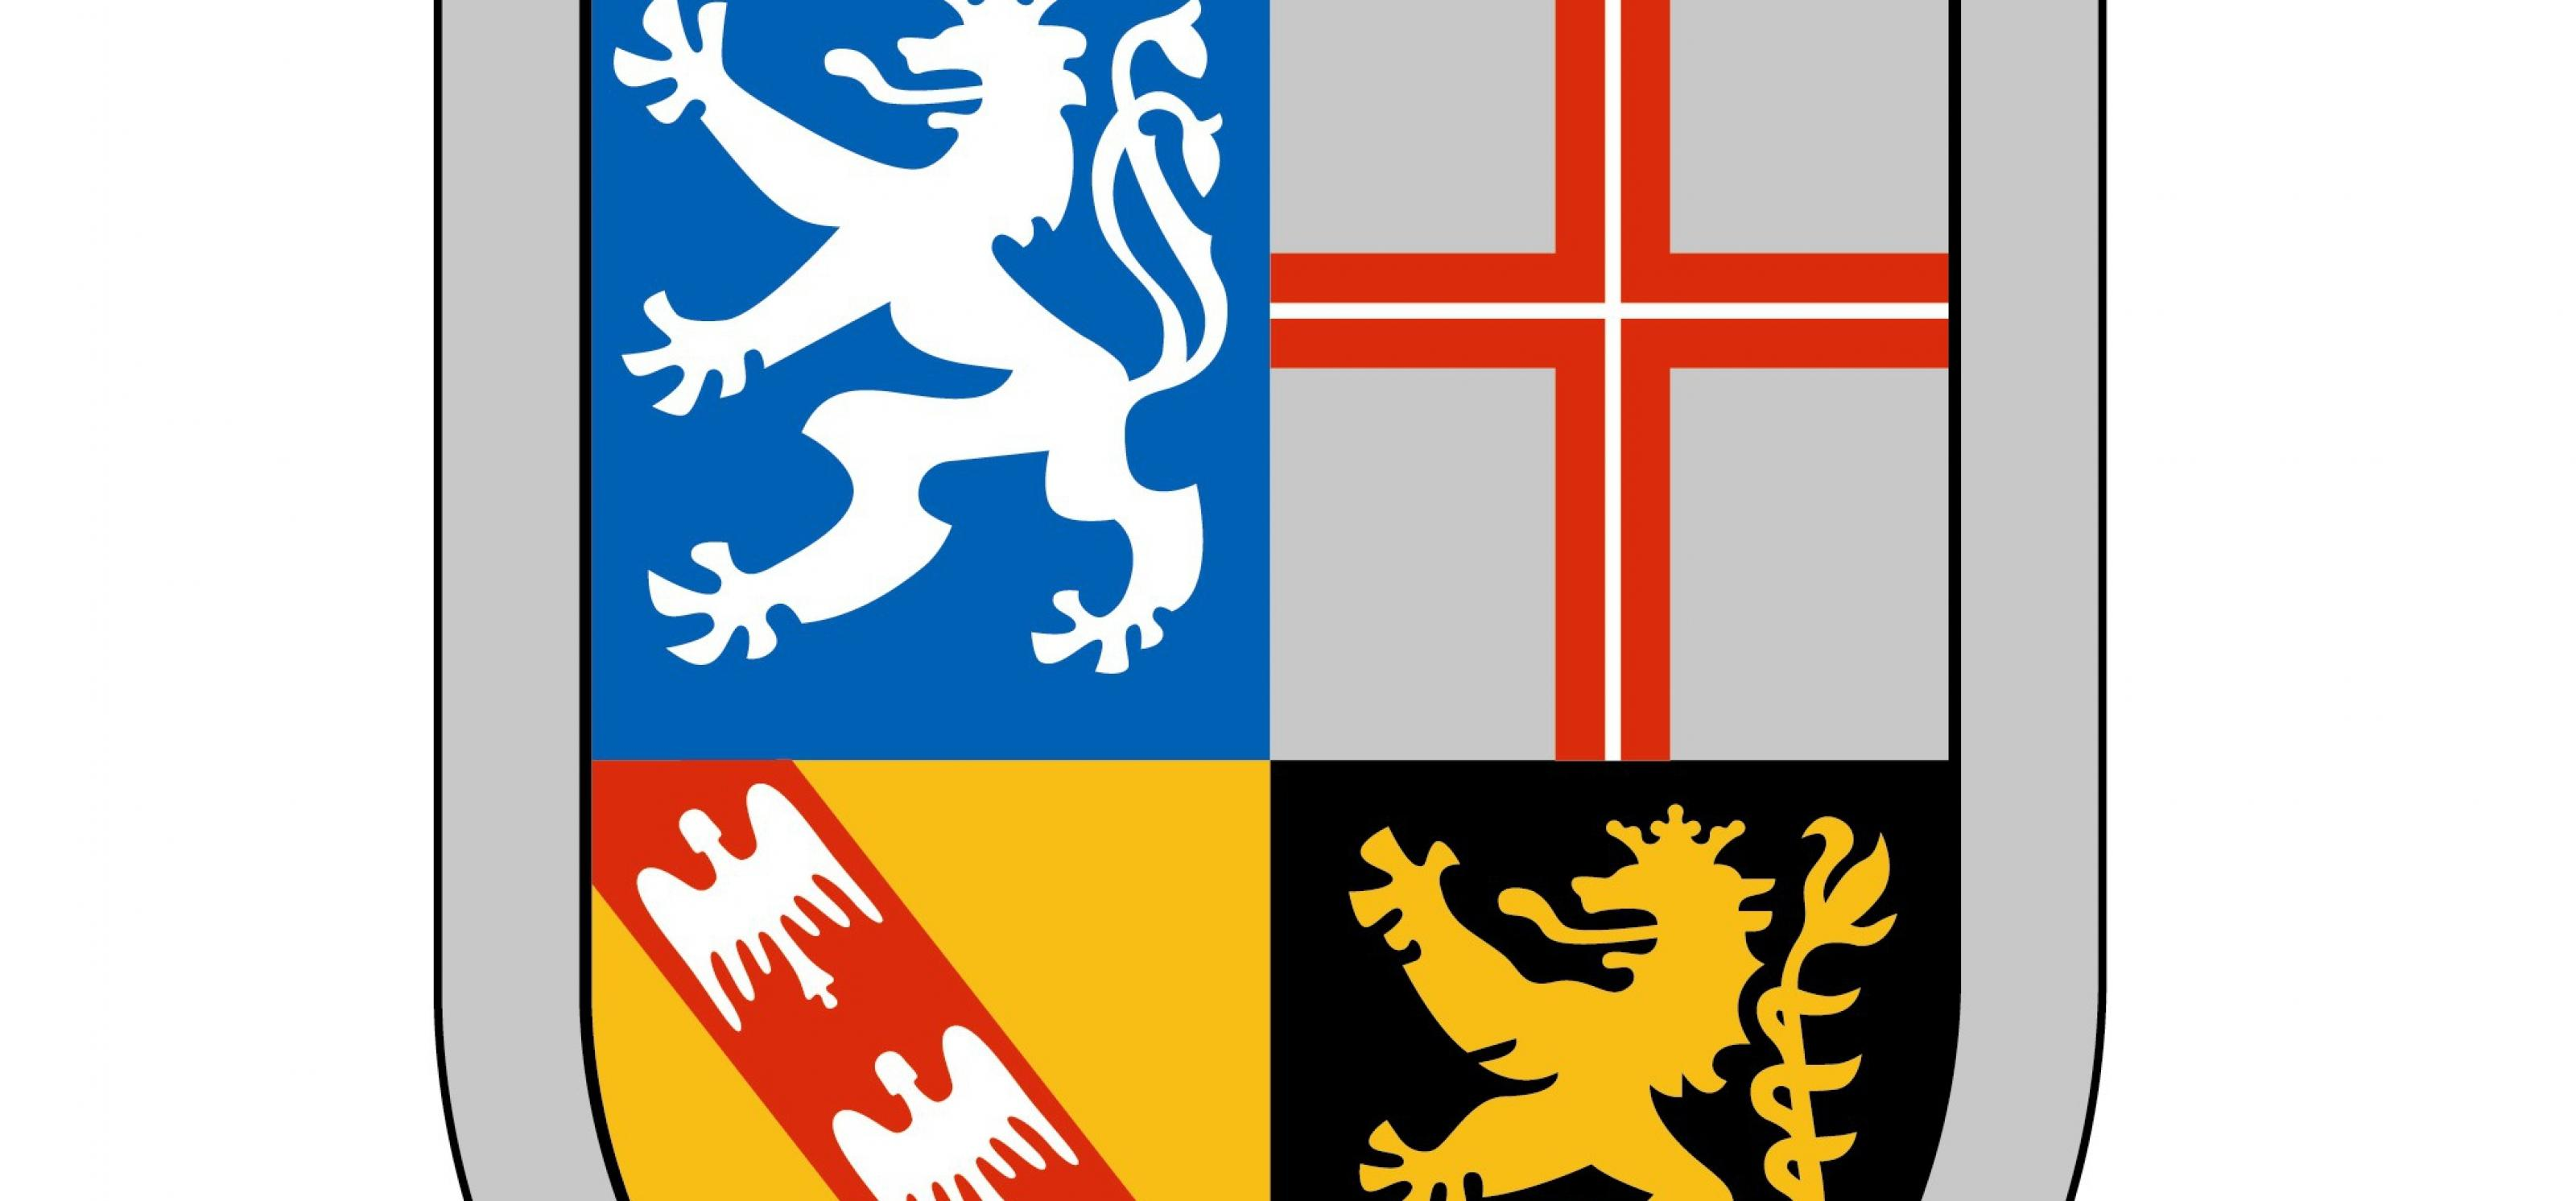 Das Wappen des Saarlands